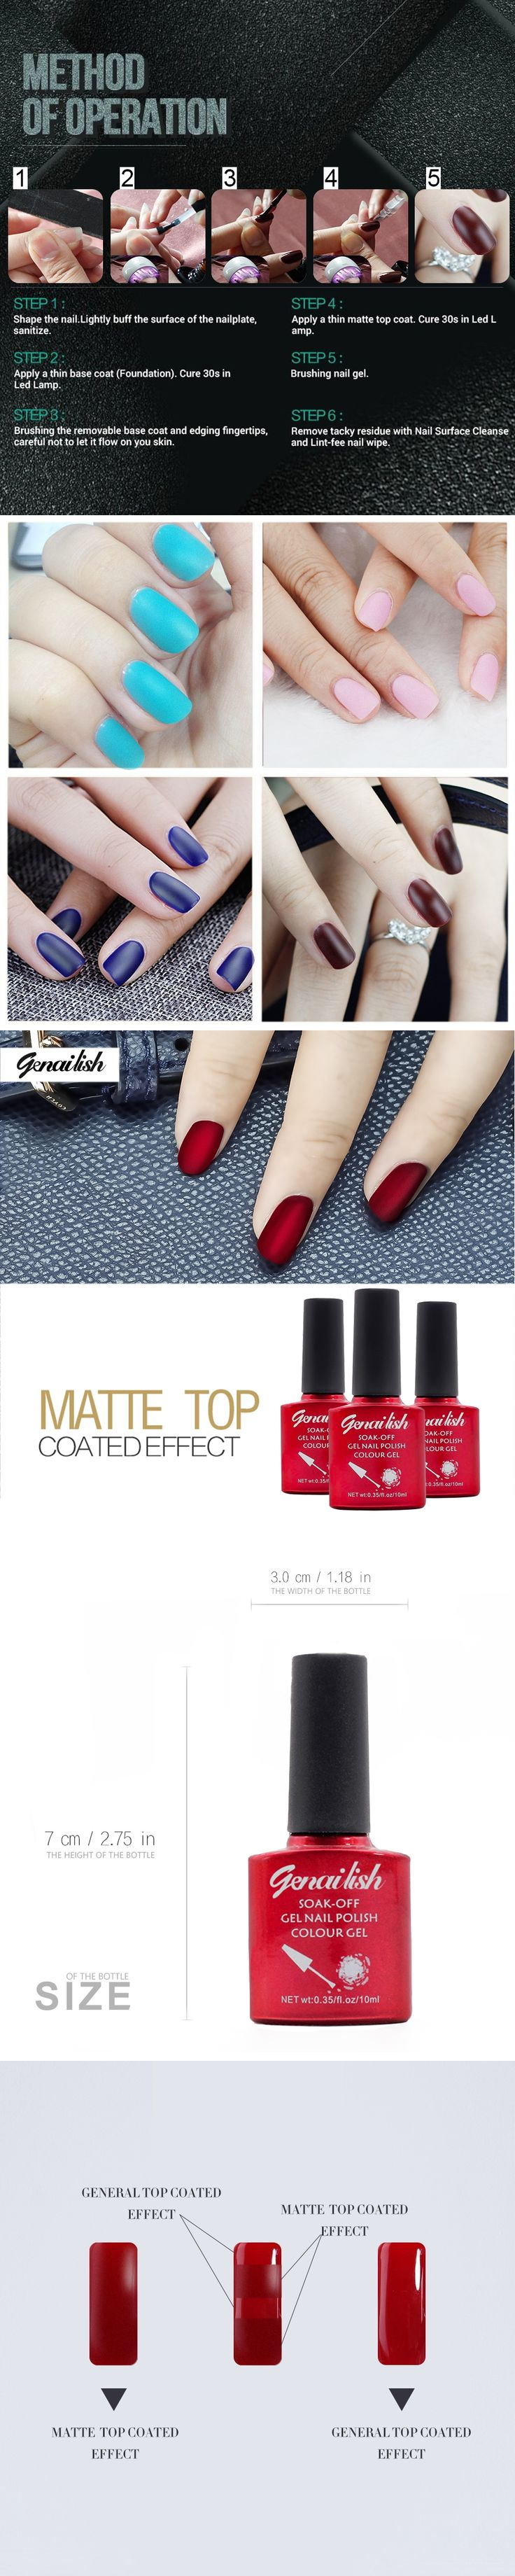 genailish 10ml Cleaning Matt Top Coat Matt Lacquer Gel Nail Polish Matte Nail Gel Layer Varnish Matte Top Gel Polish Nail Var